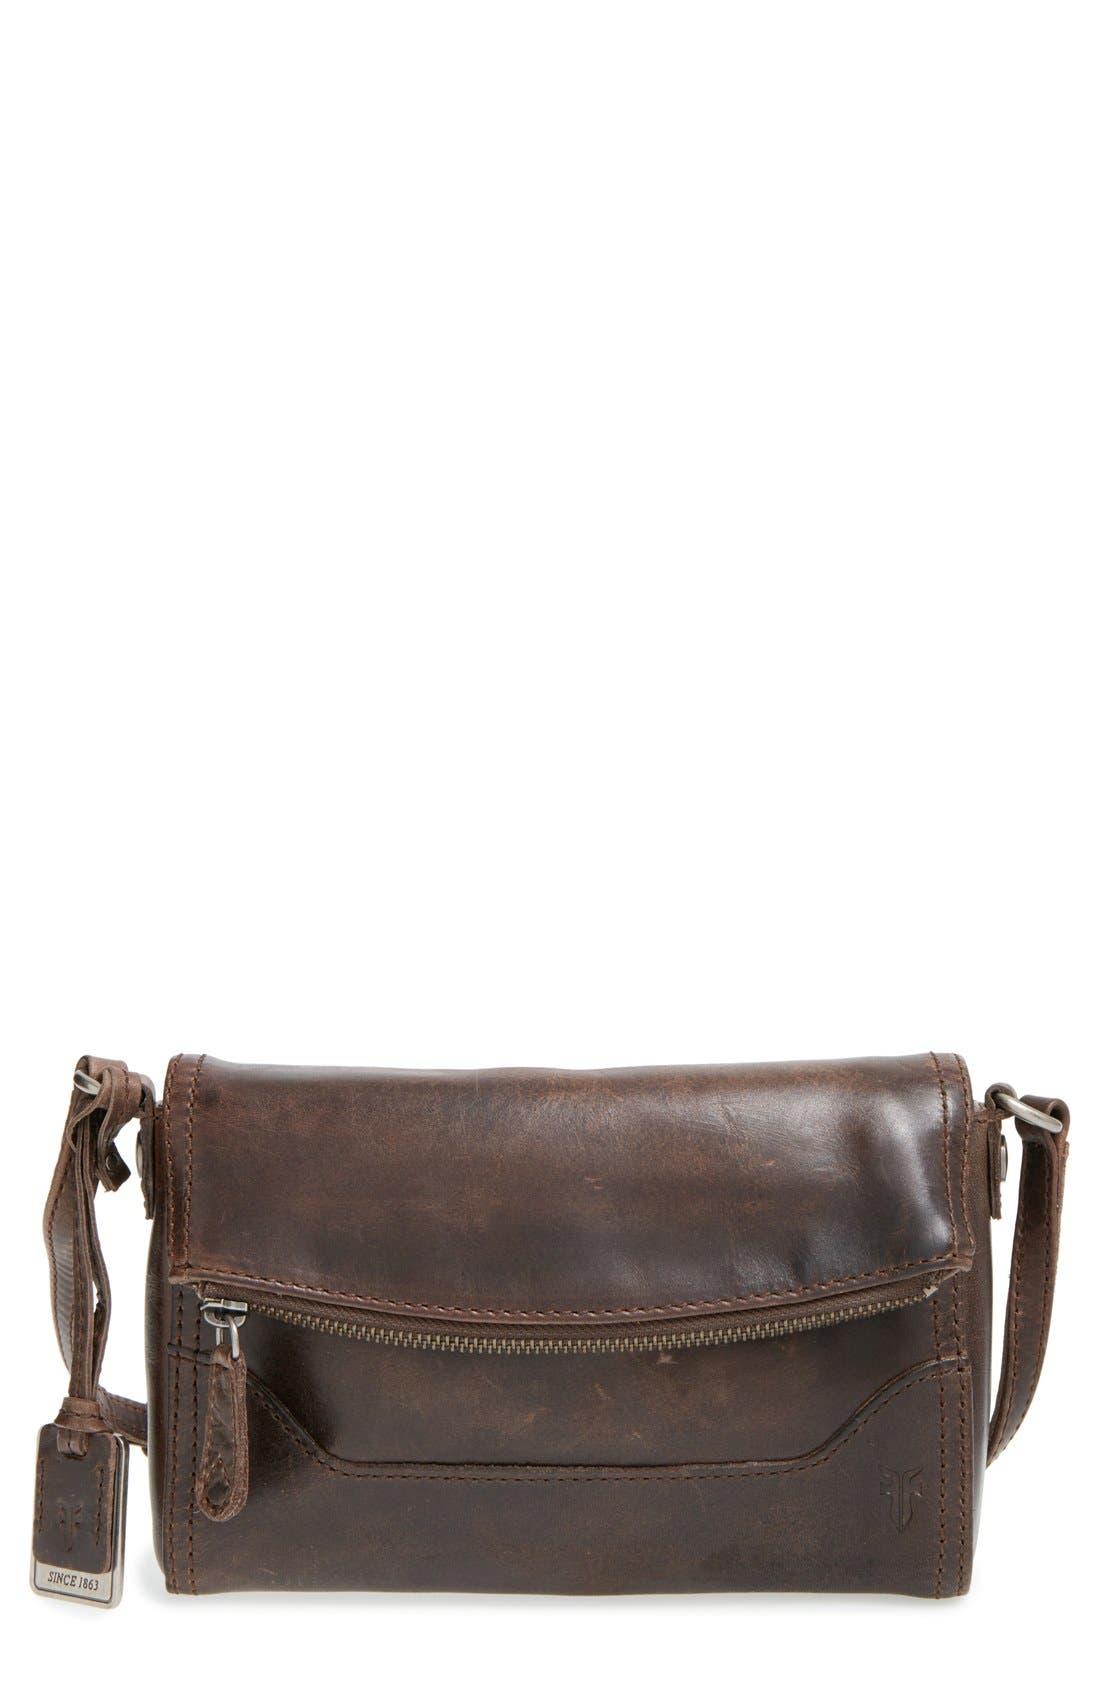 'Melissa' Foldover Flap Crossbody Bag, Main, color, 020